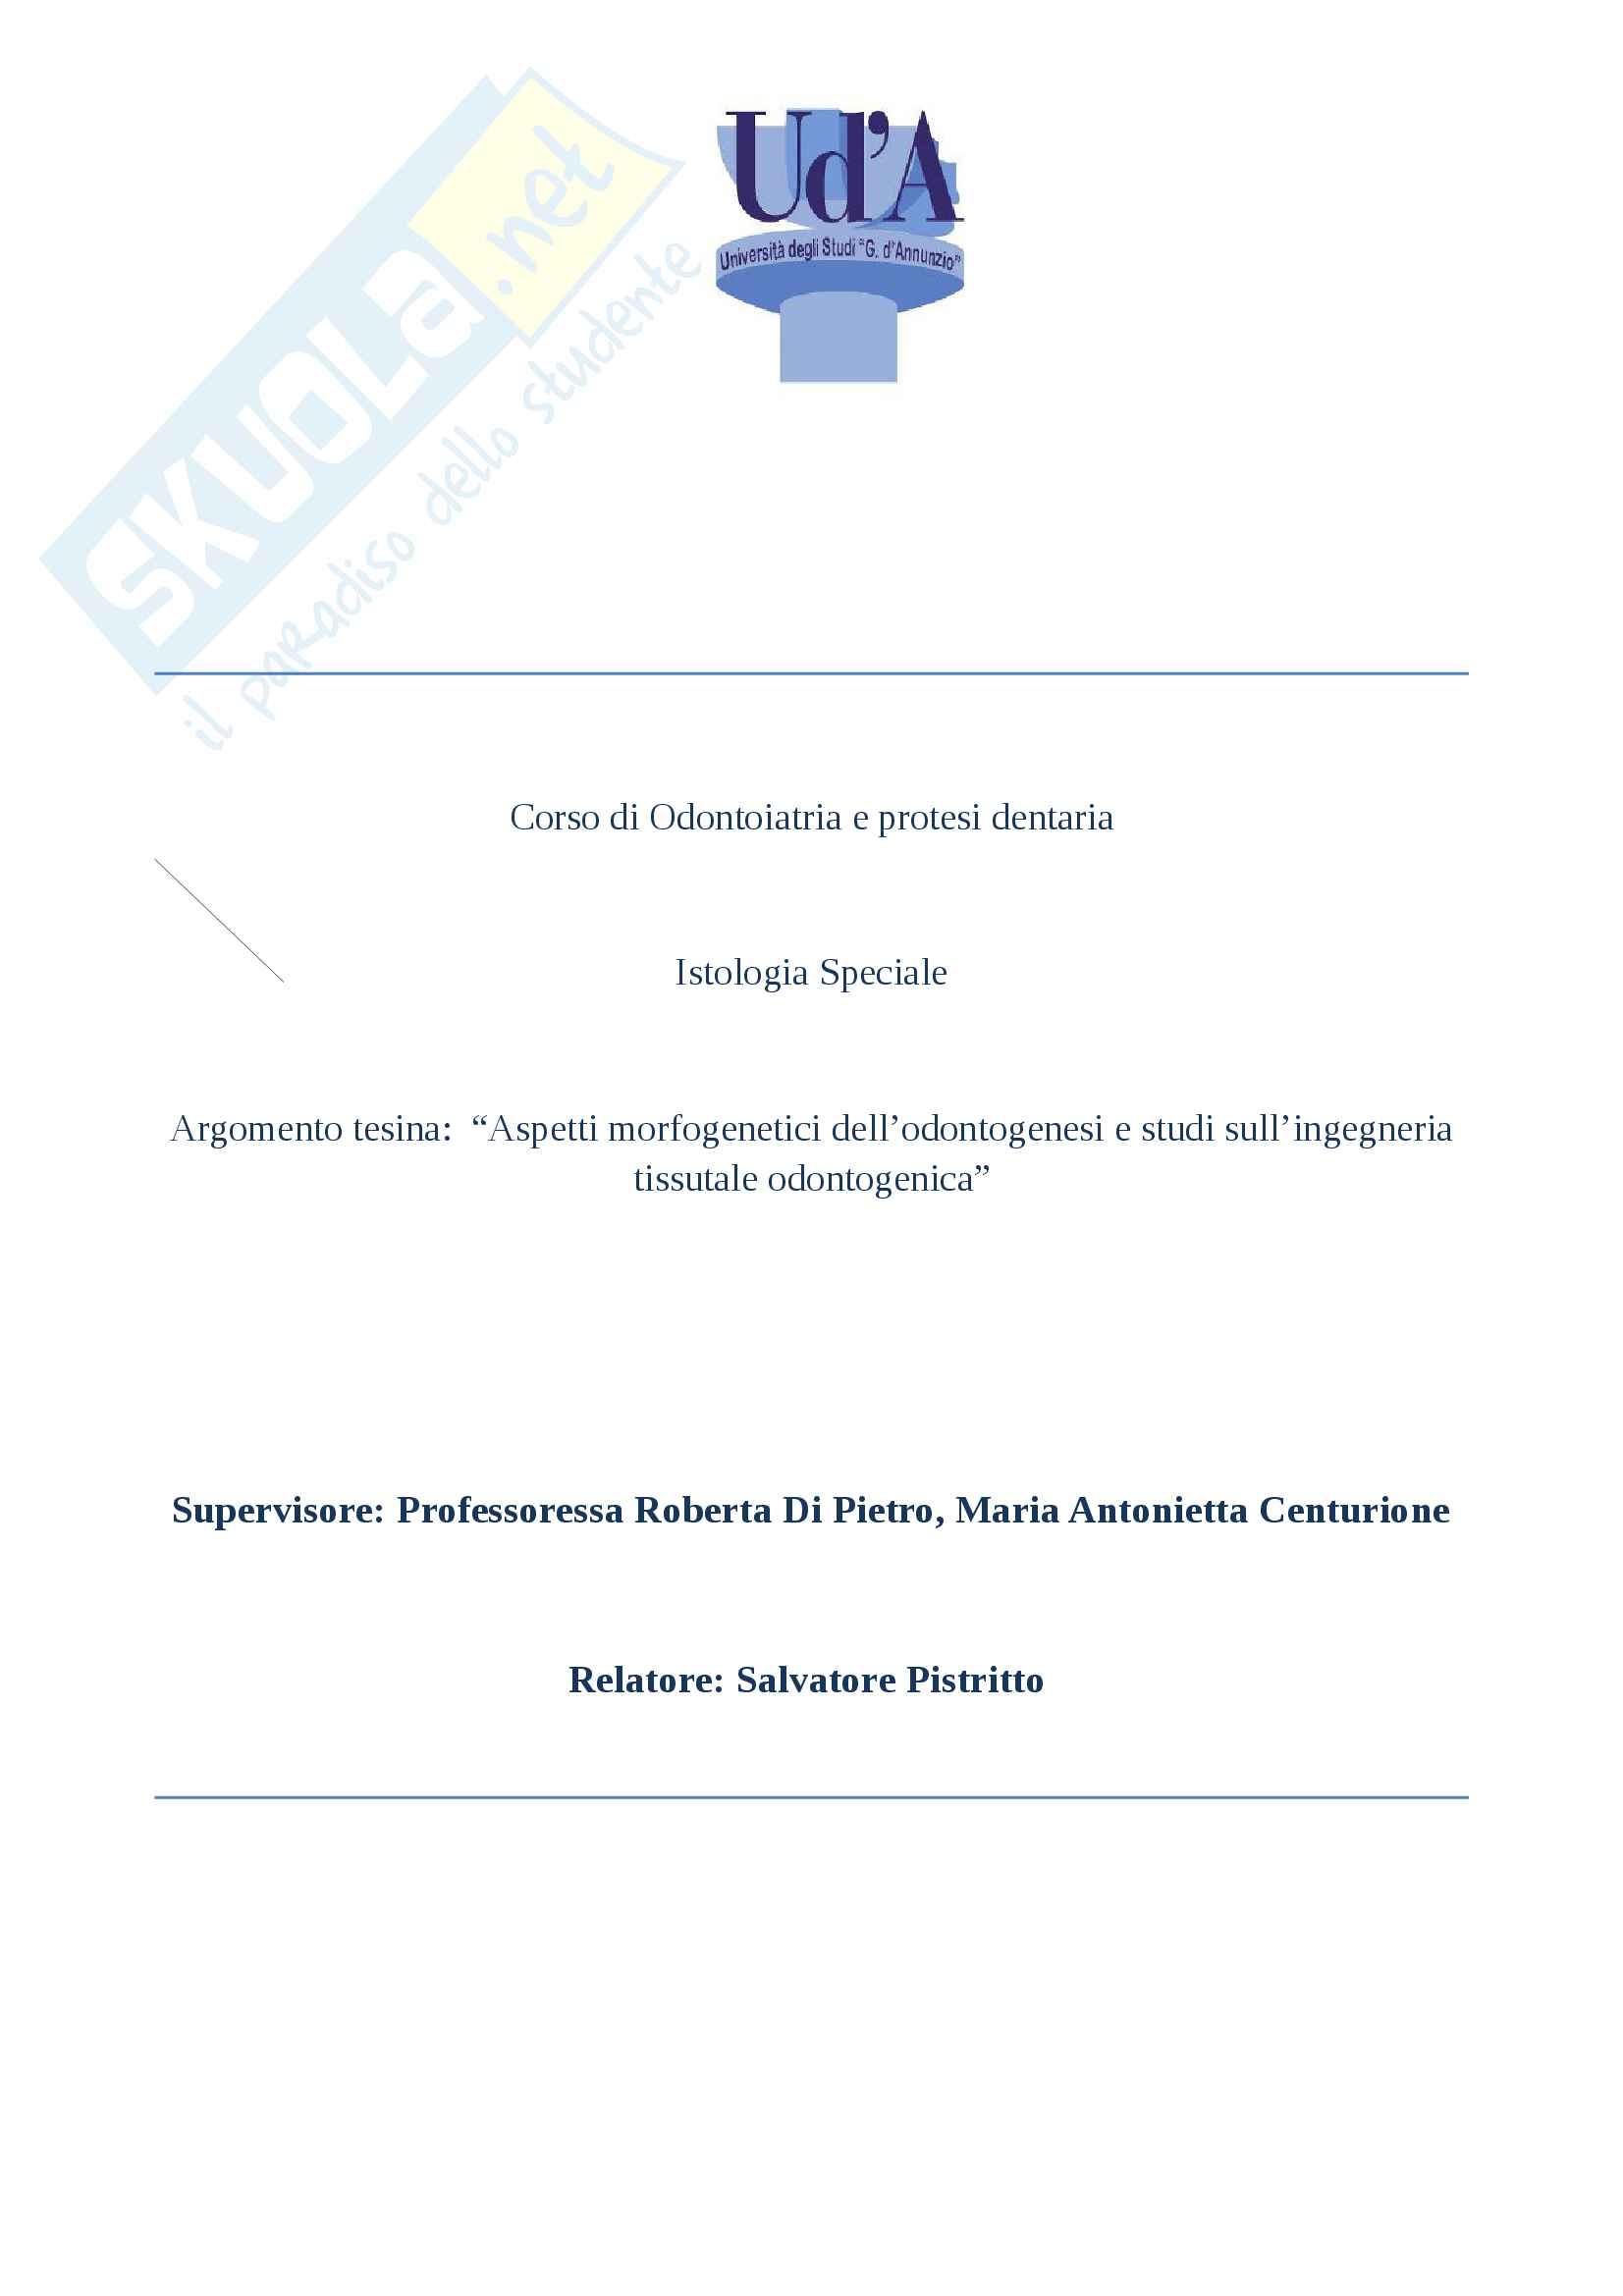 Tesina Odontogenesi, Istologia Speciale